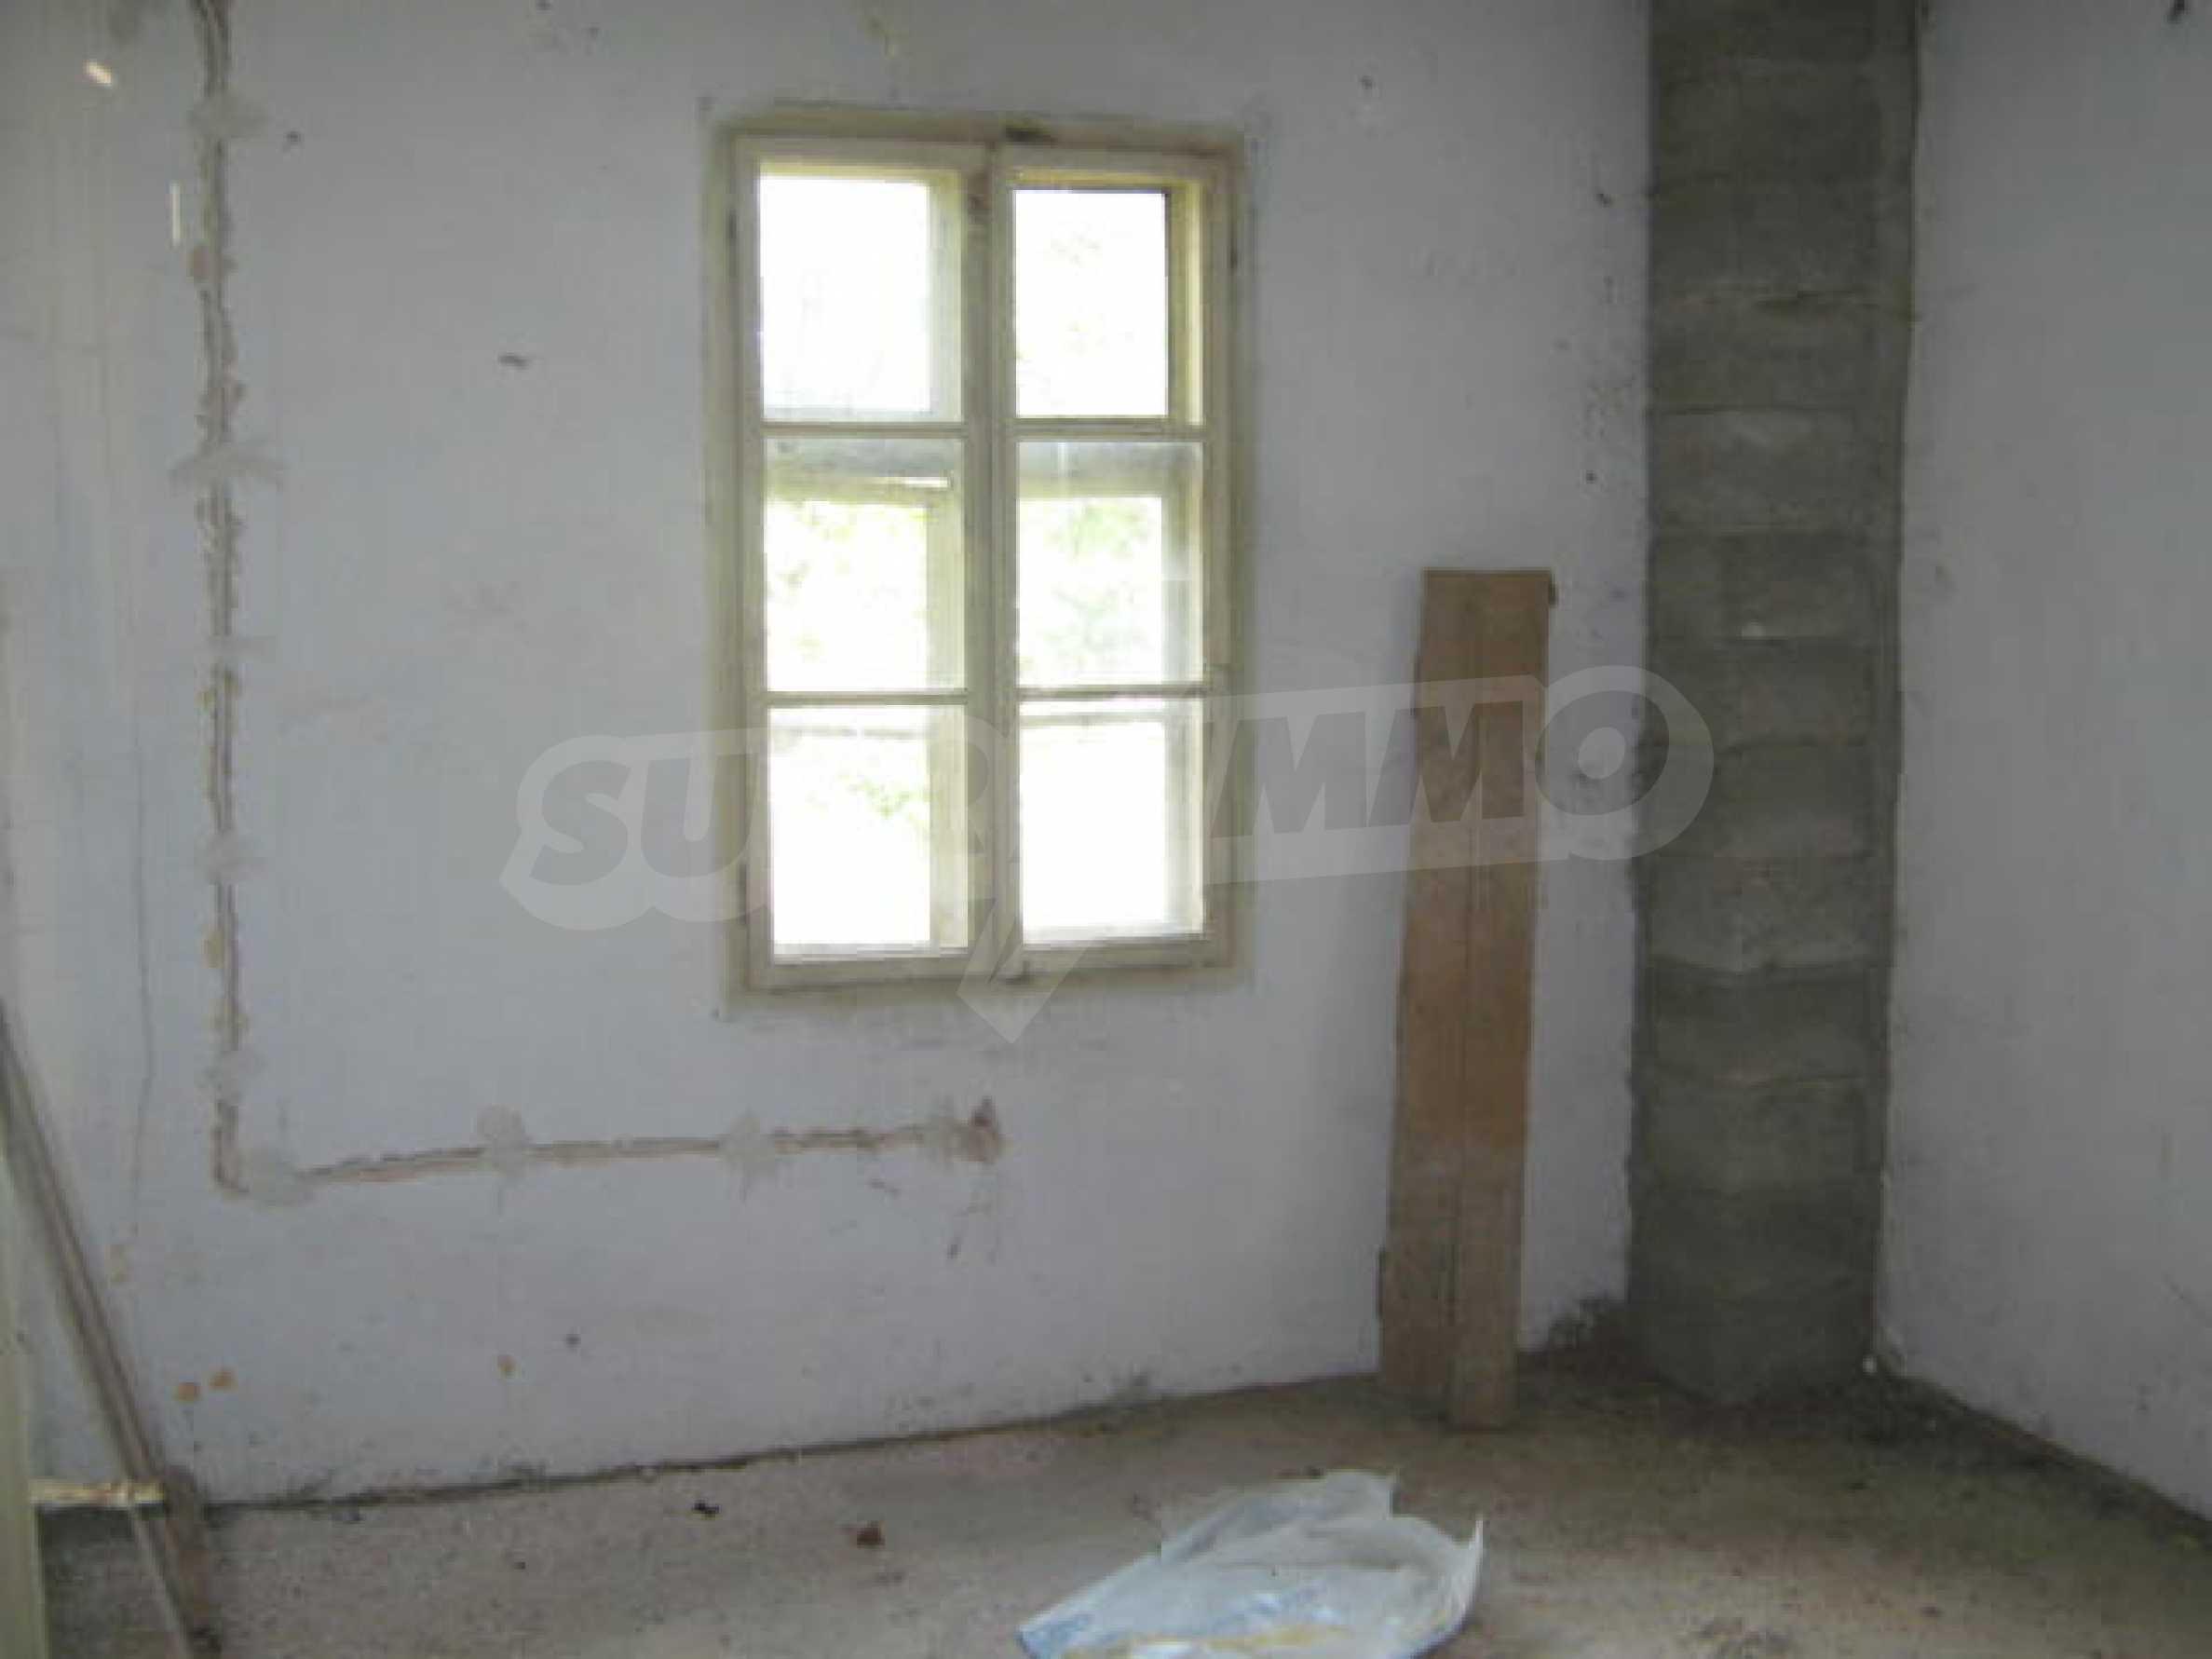 House for sale in village near Vidin 4